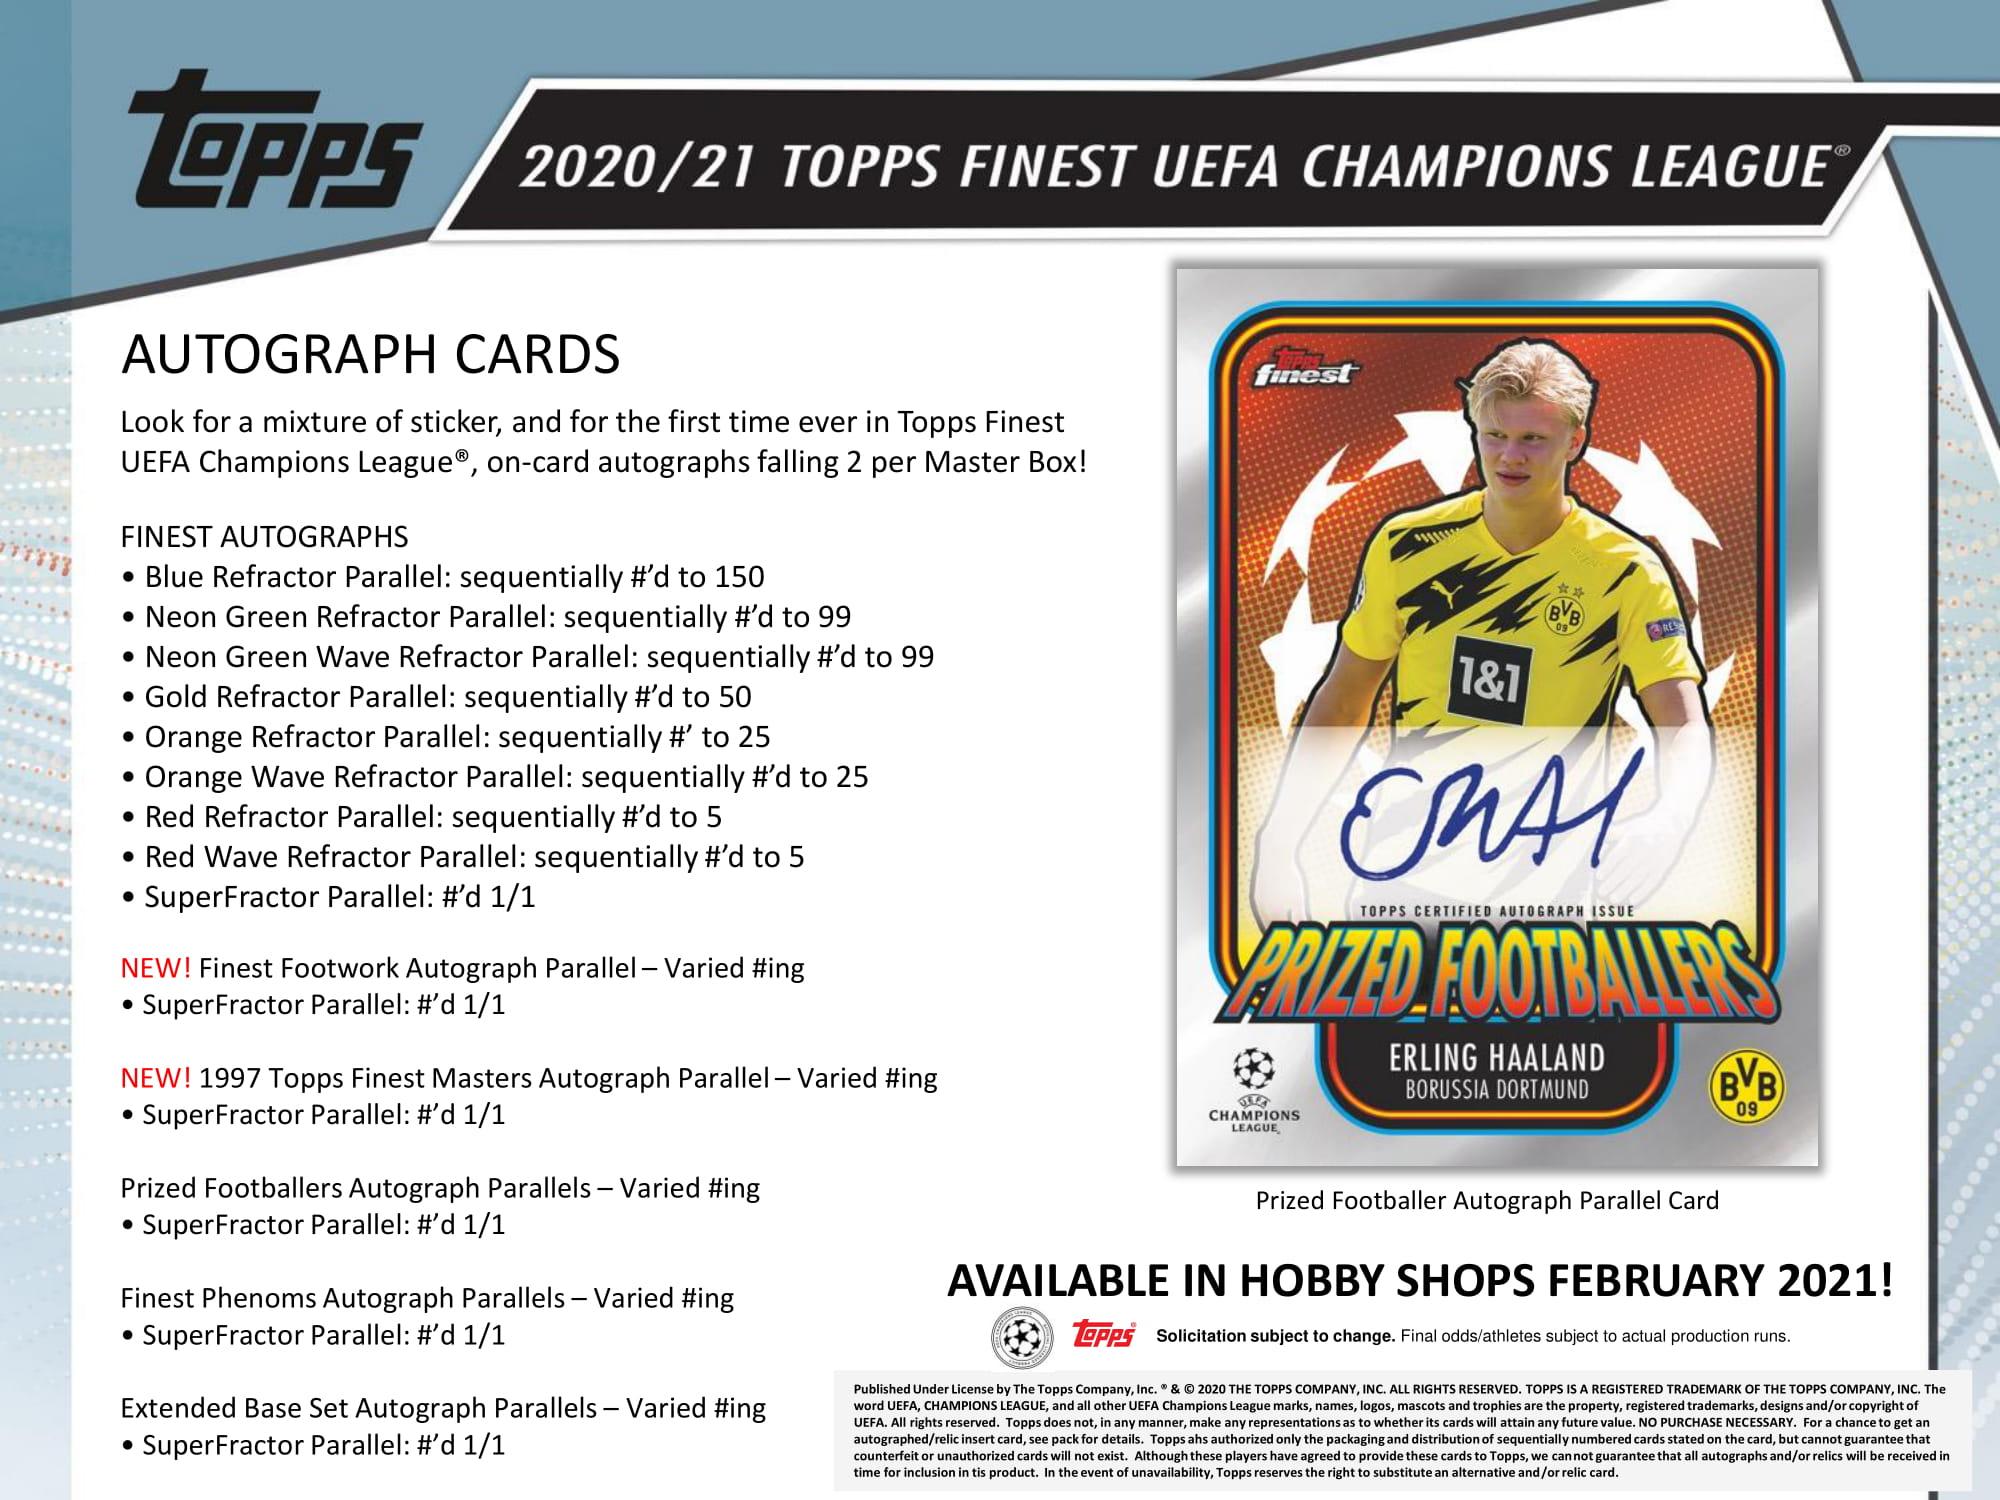 Borussia Dortmund European Champions League winners 1997 football trading cards